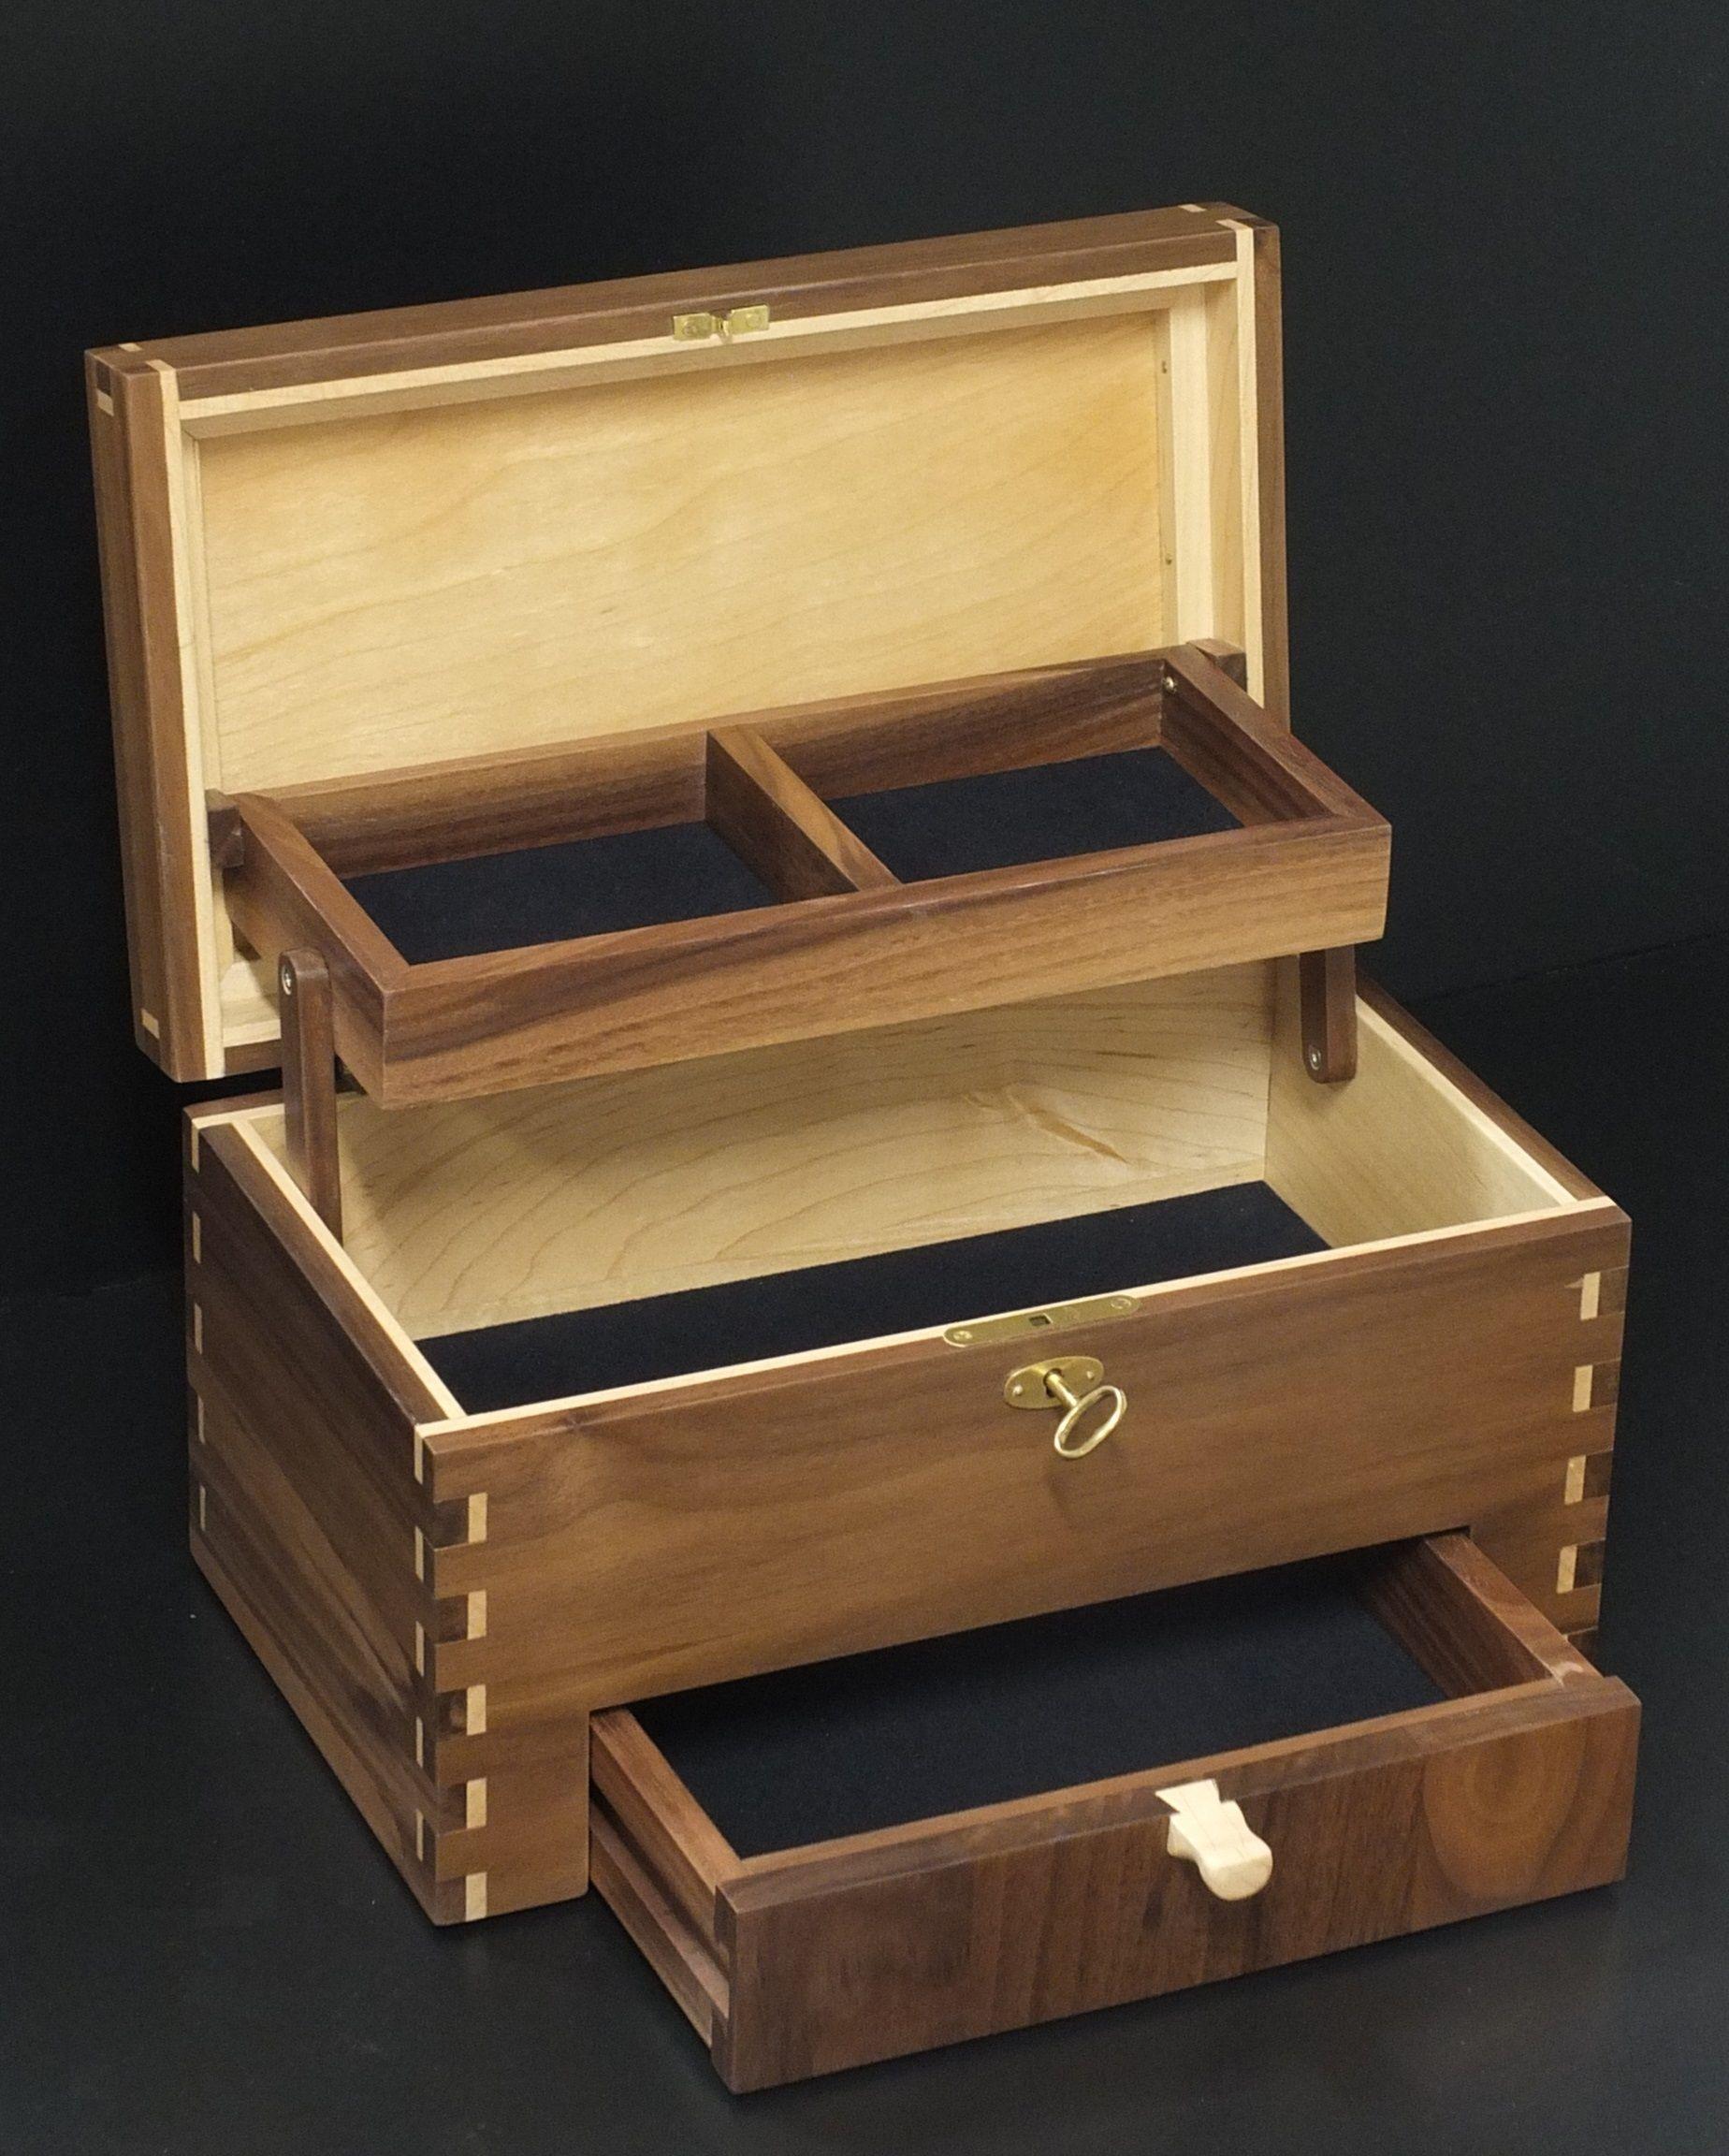 Jewelery Box Designs : jewelery, designs, Handmade, Jewelrybox, Lennart, Boersma, Jewelry, Plans,, Wooden, Designs